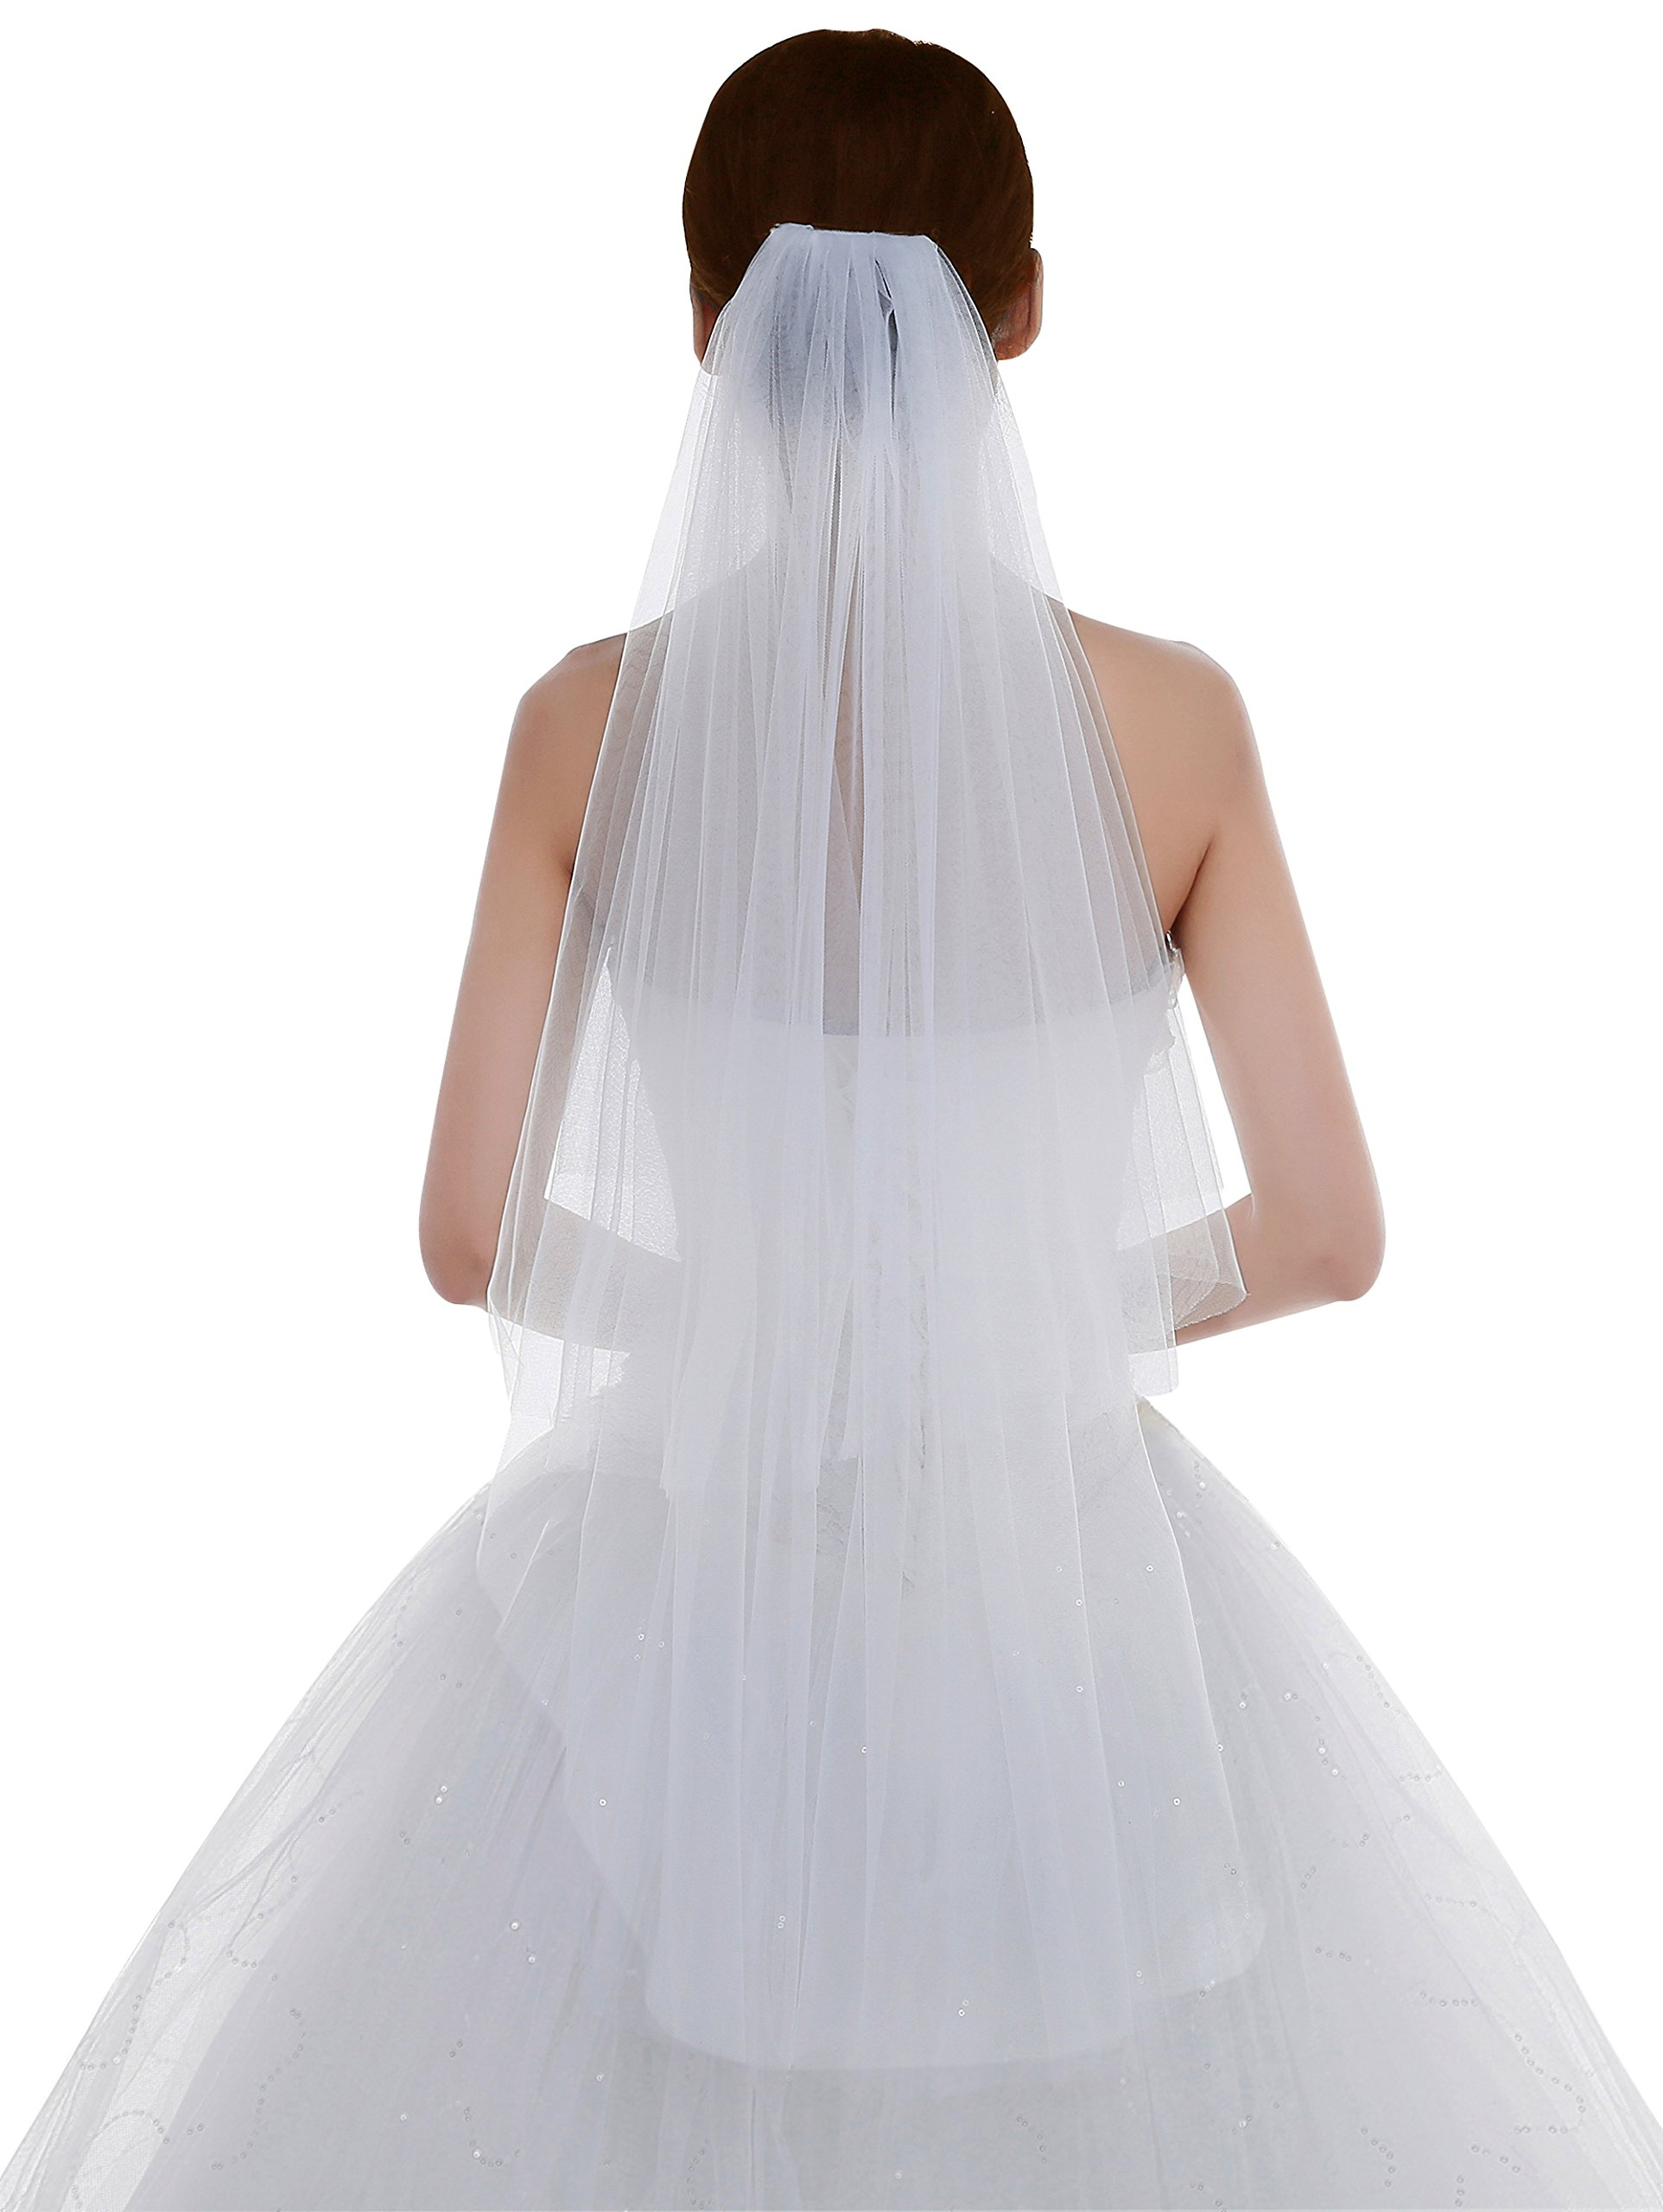 Edith qi Women's Simple Tulle Bridal Veil Short Wedding Veil